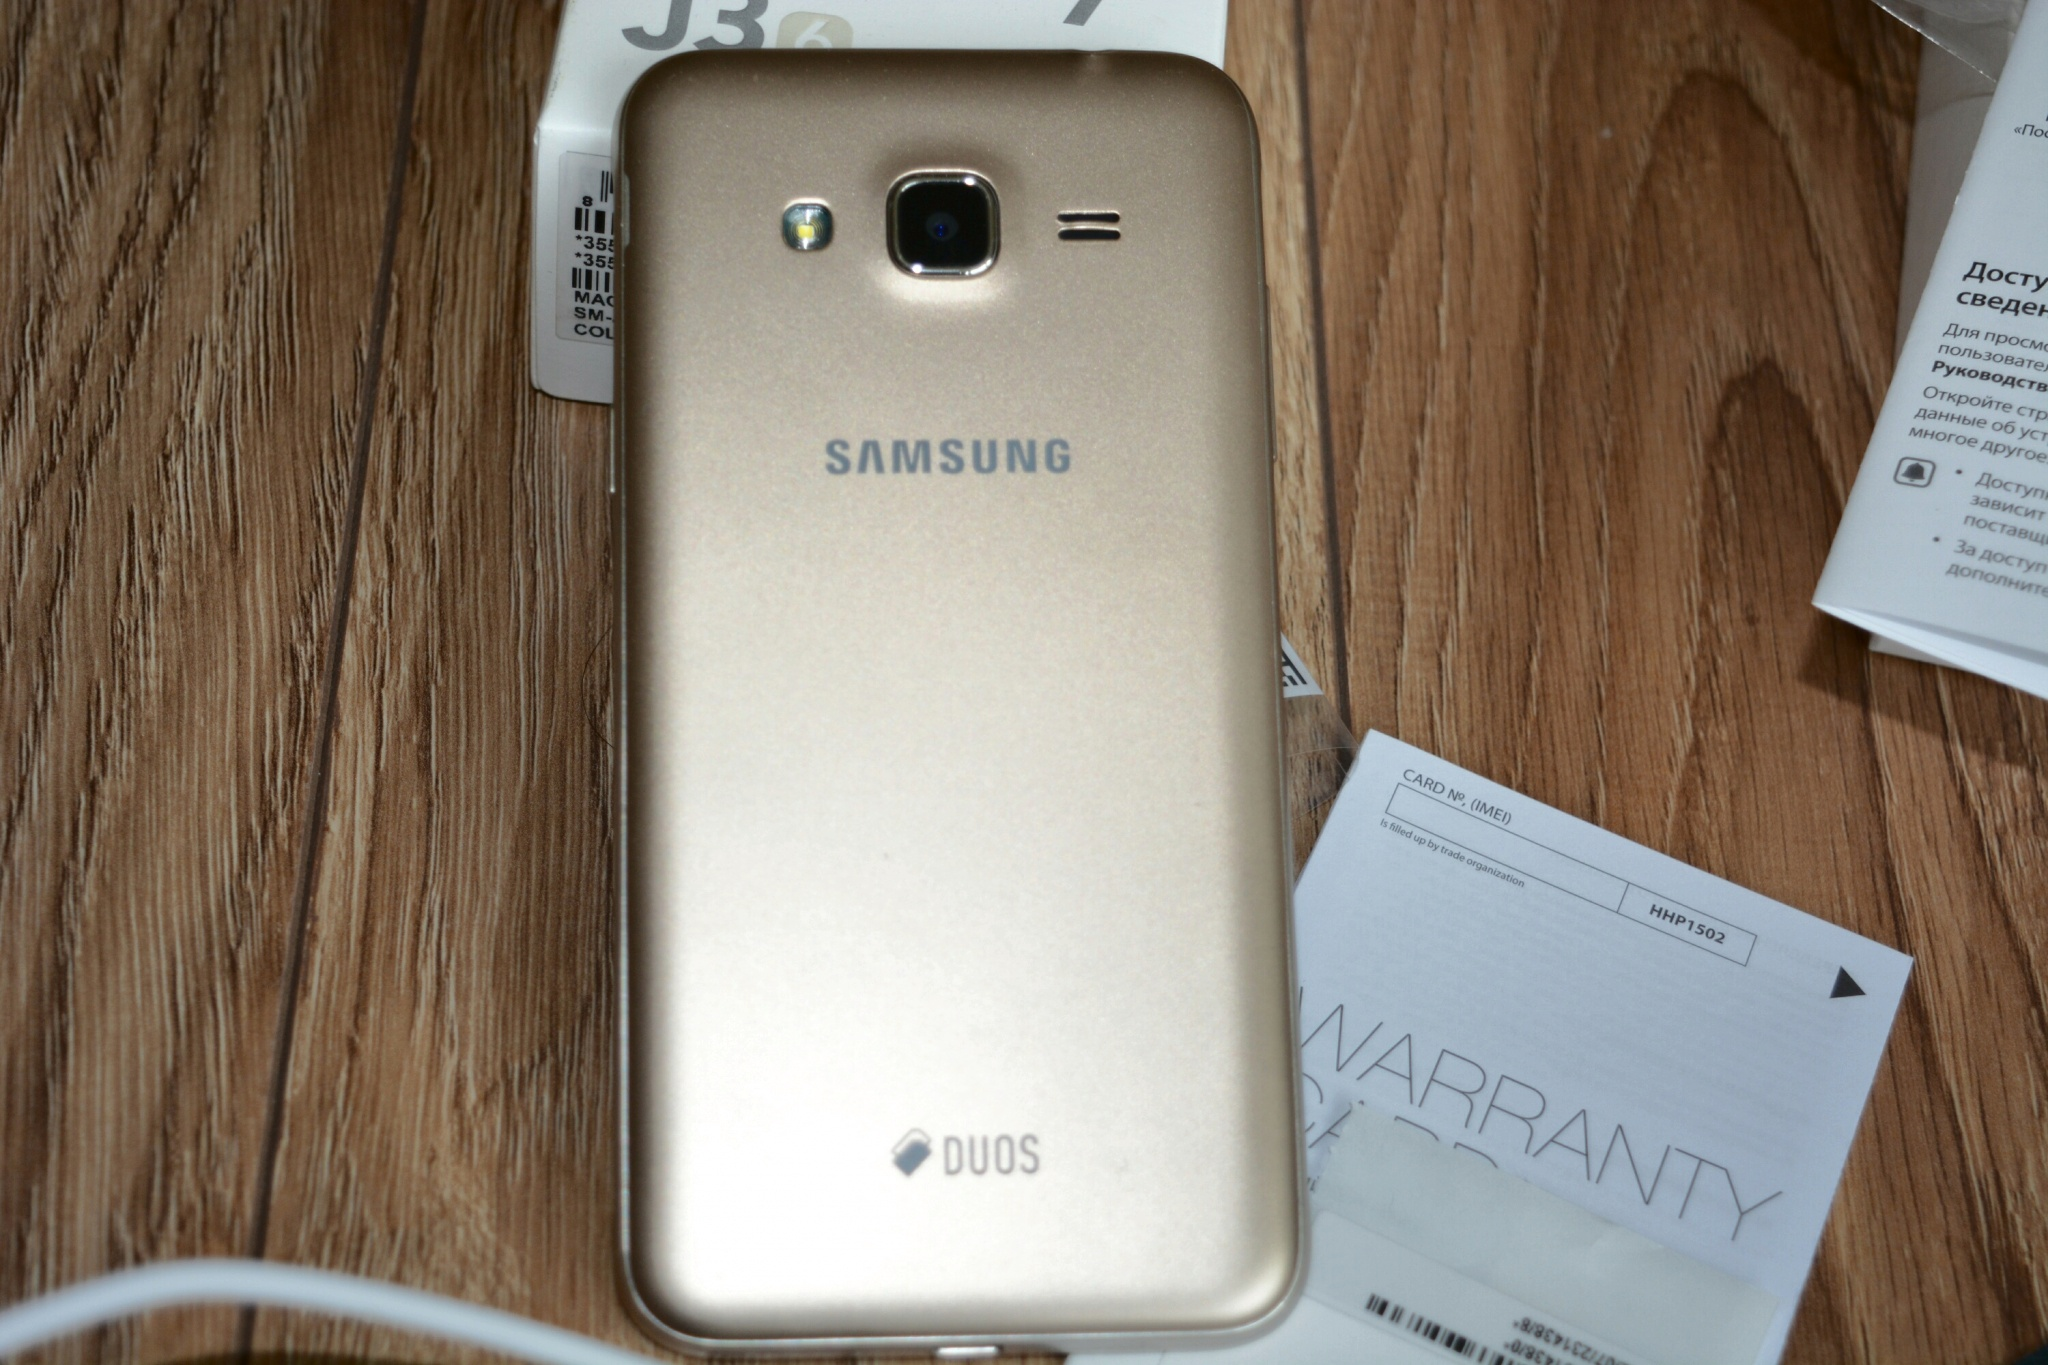 e22ab92b45cf Обзор от покупателя на Смартфон Samsung Galaxy J3 SM-J320F (золотой ...